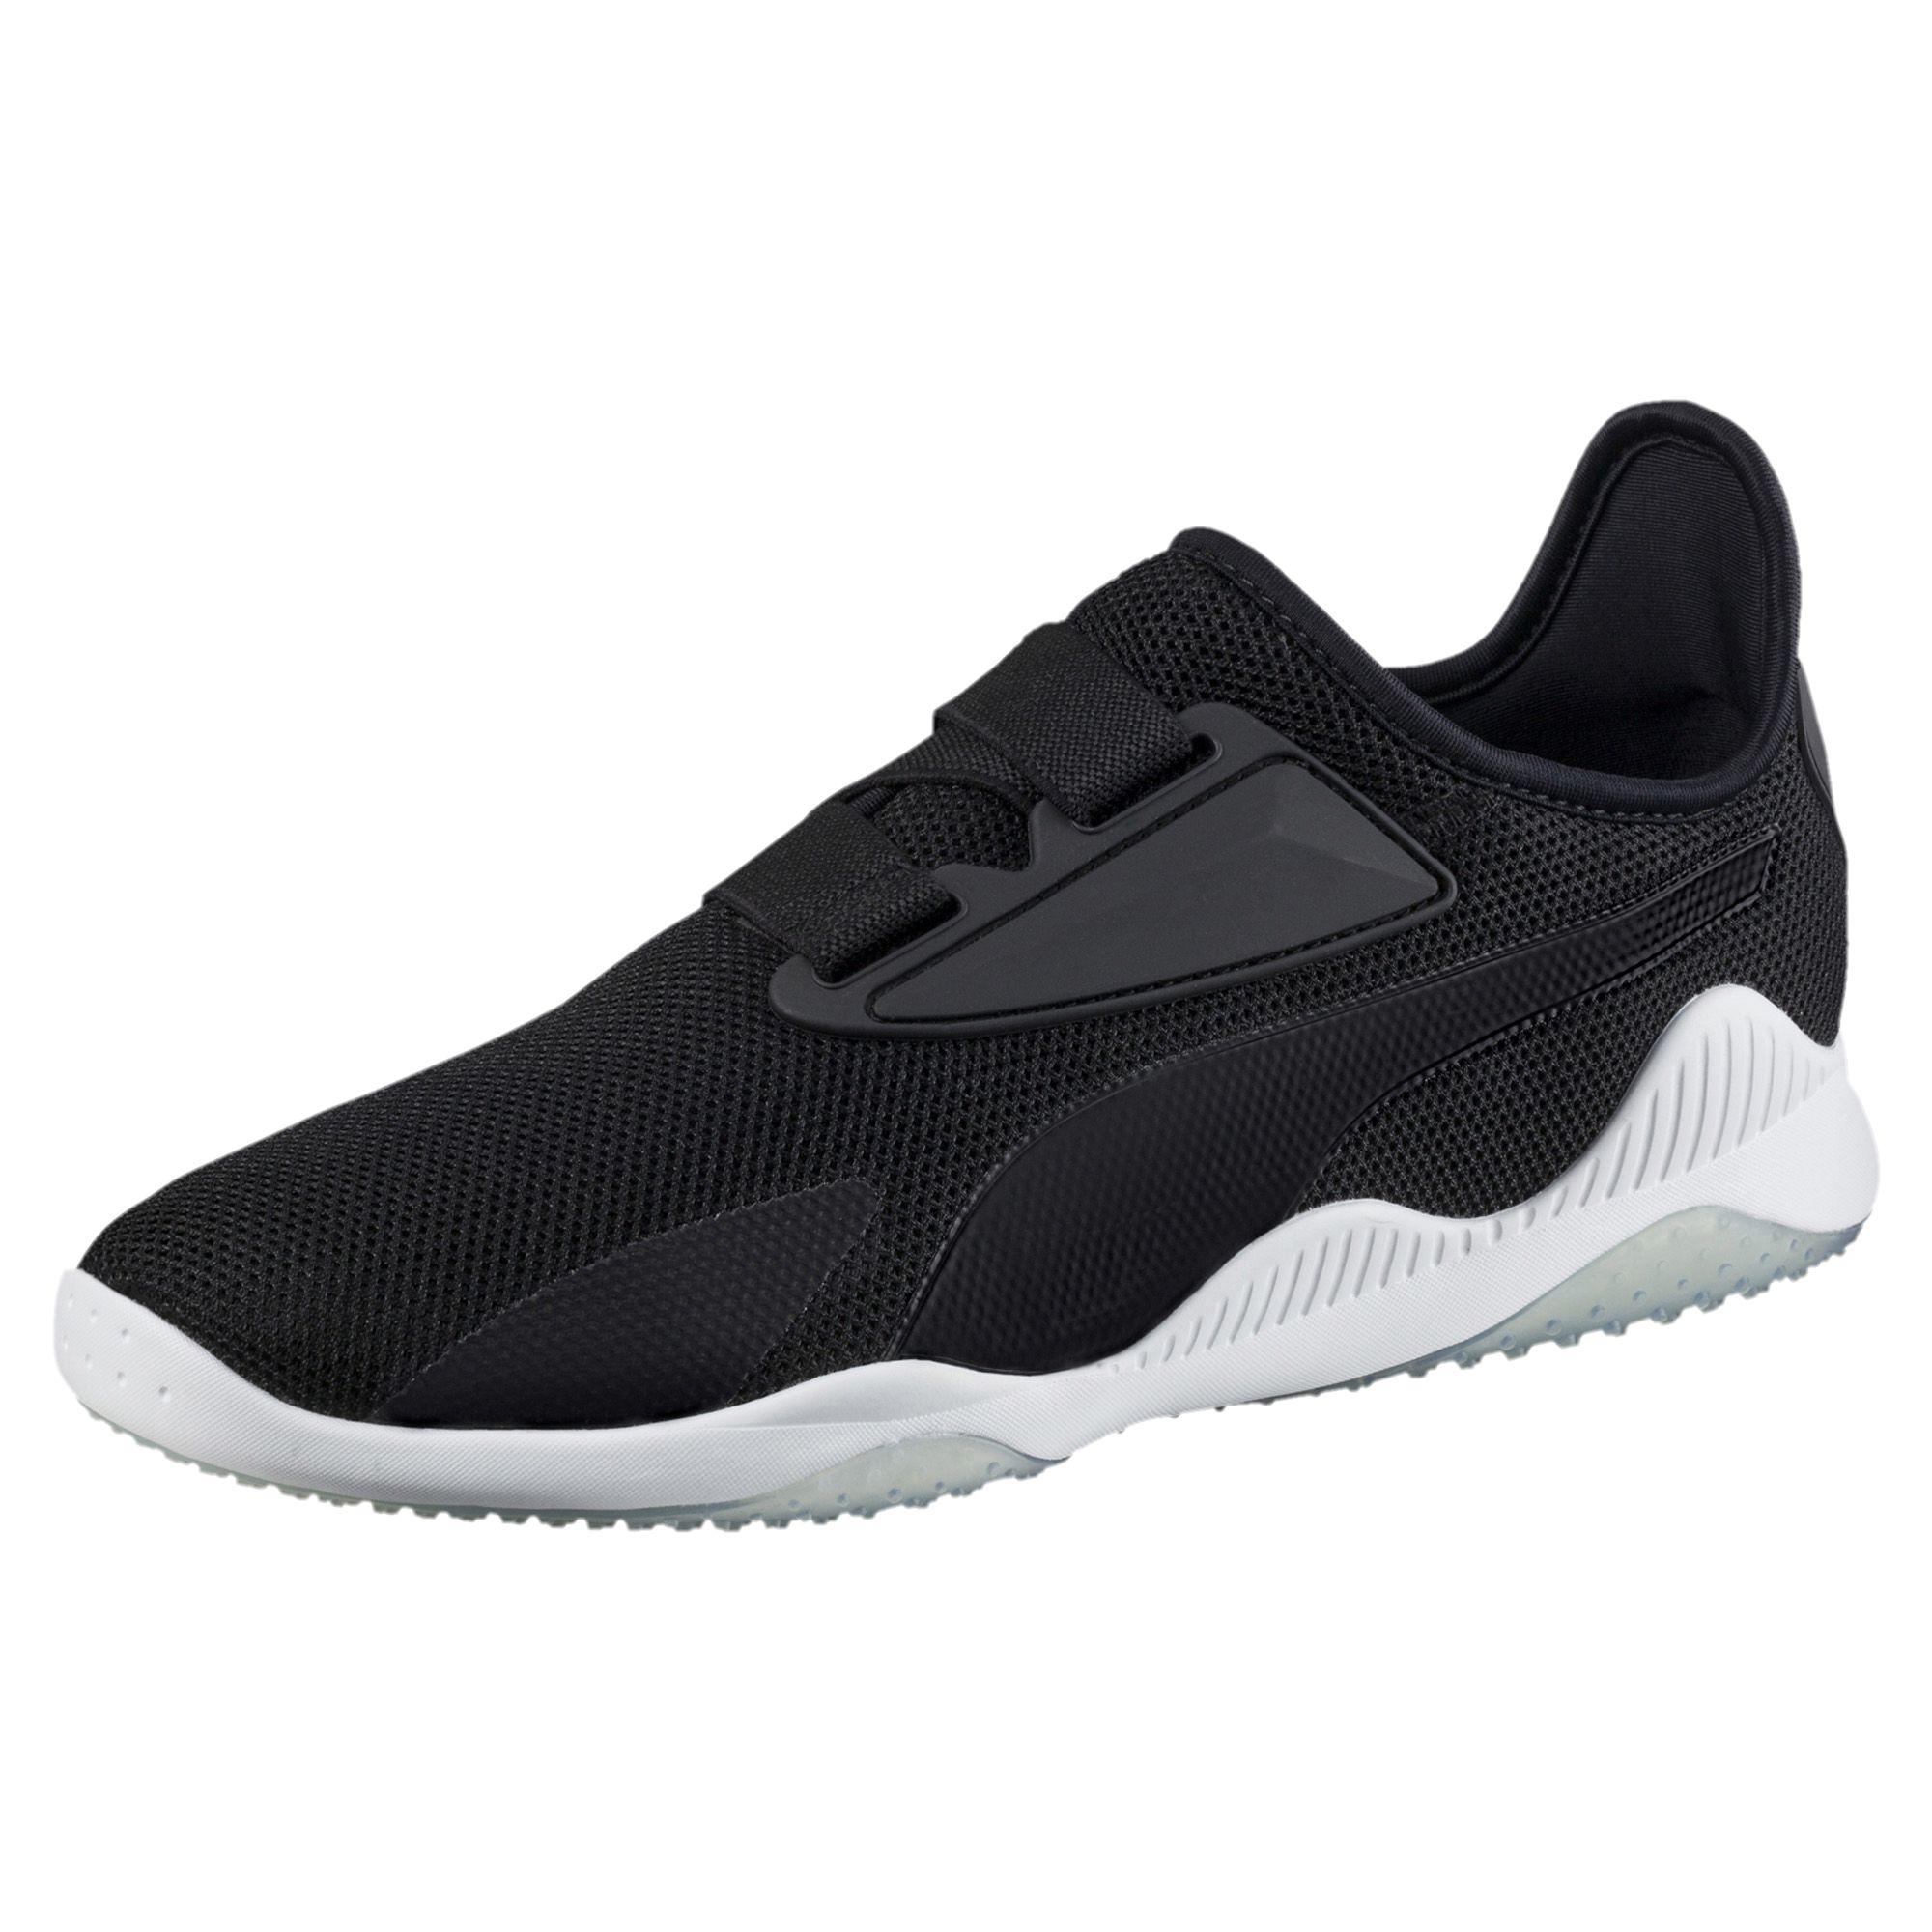 puma mostro puma-mostro-mesh-trainers-men-shoe-evolution-new LXNROGO